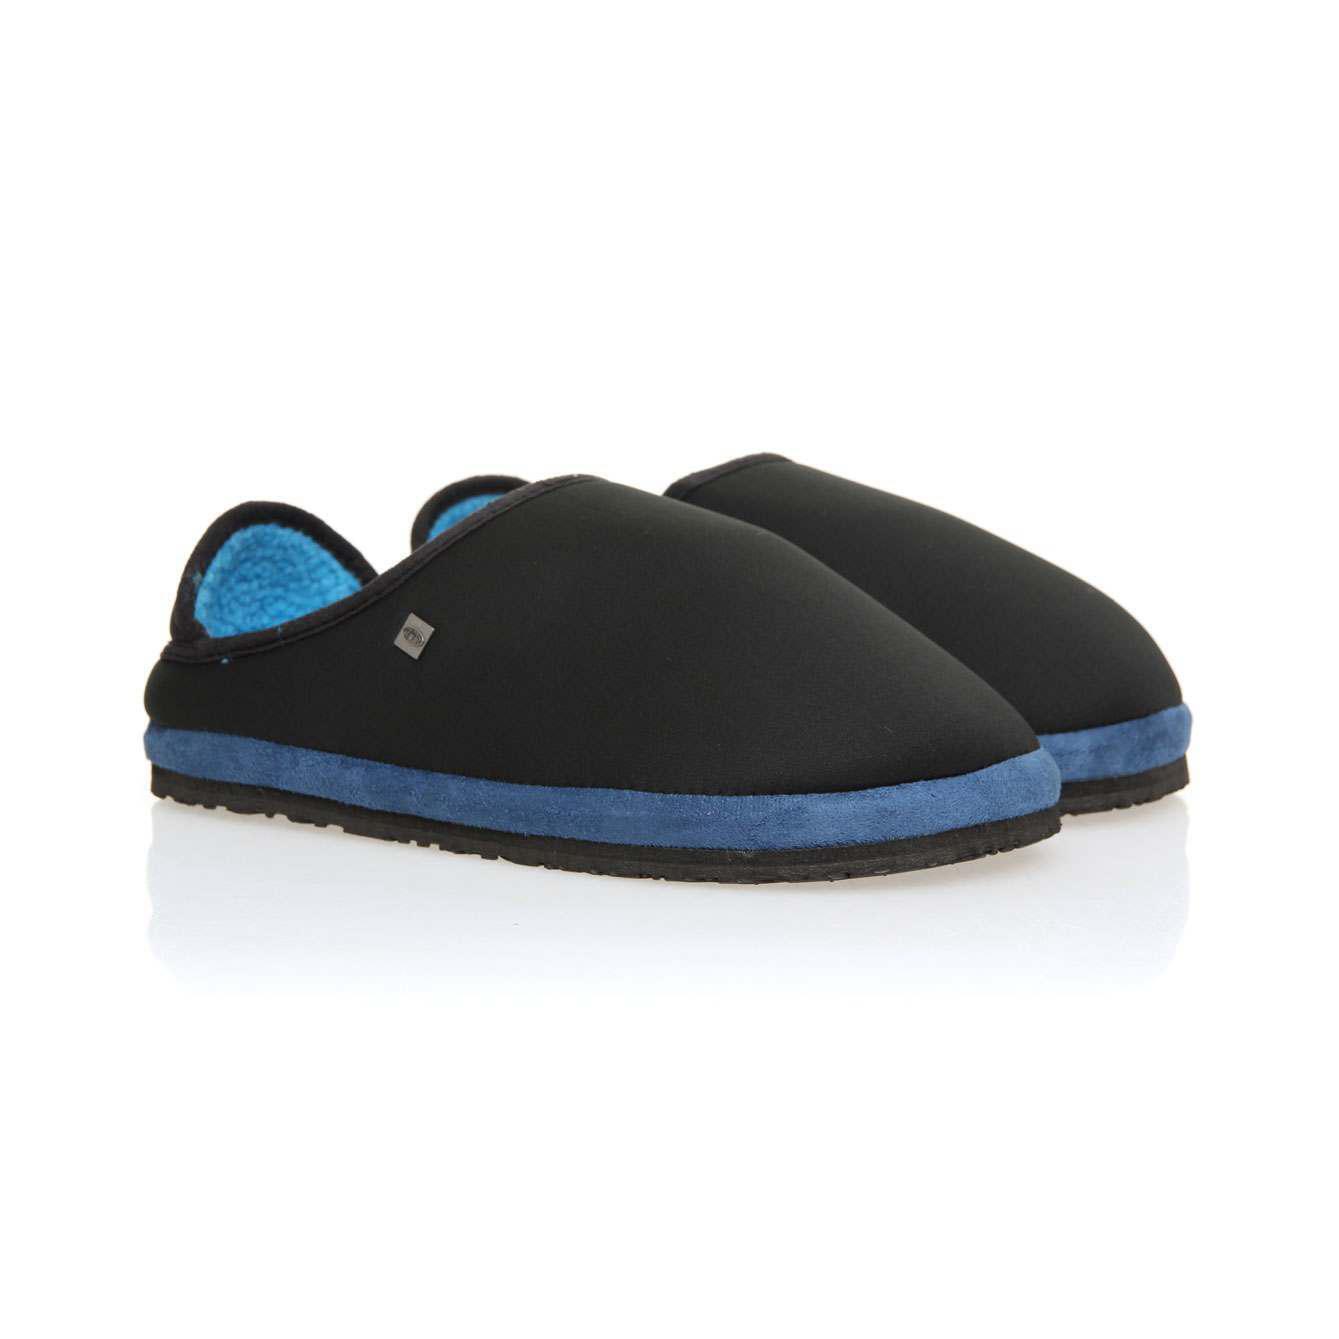 ebdb9b5e9ff Animal Slippers Black Animal Men's shoes Slippers Eazy ntvacn2169 ...